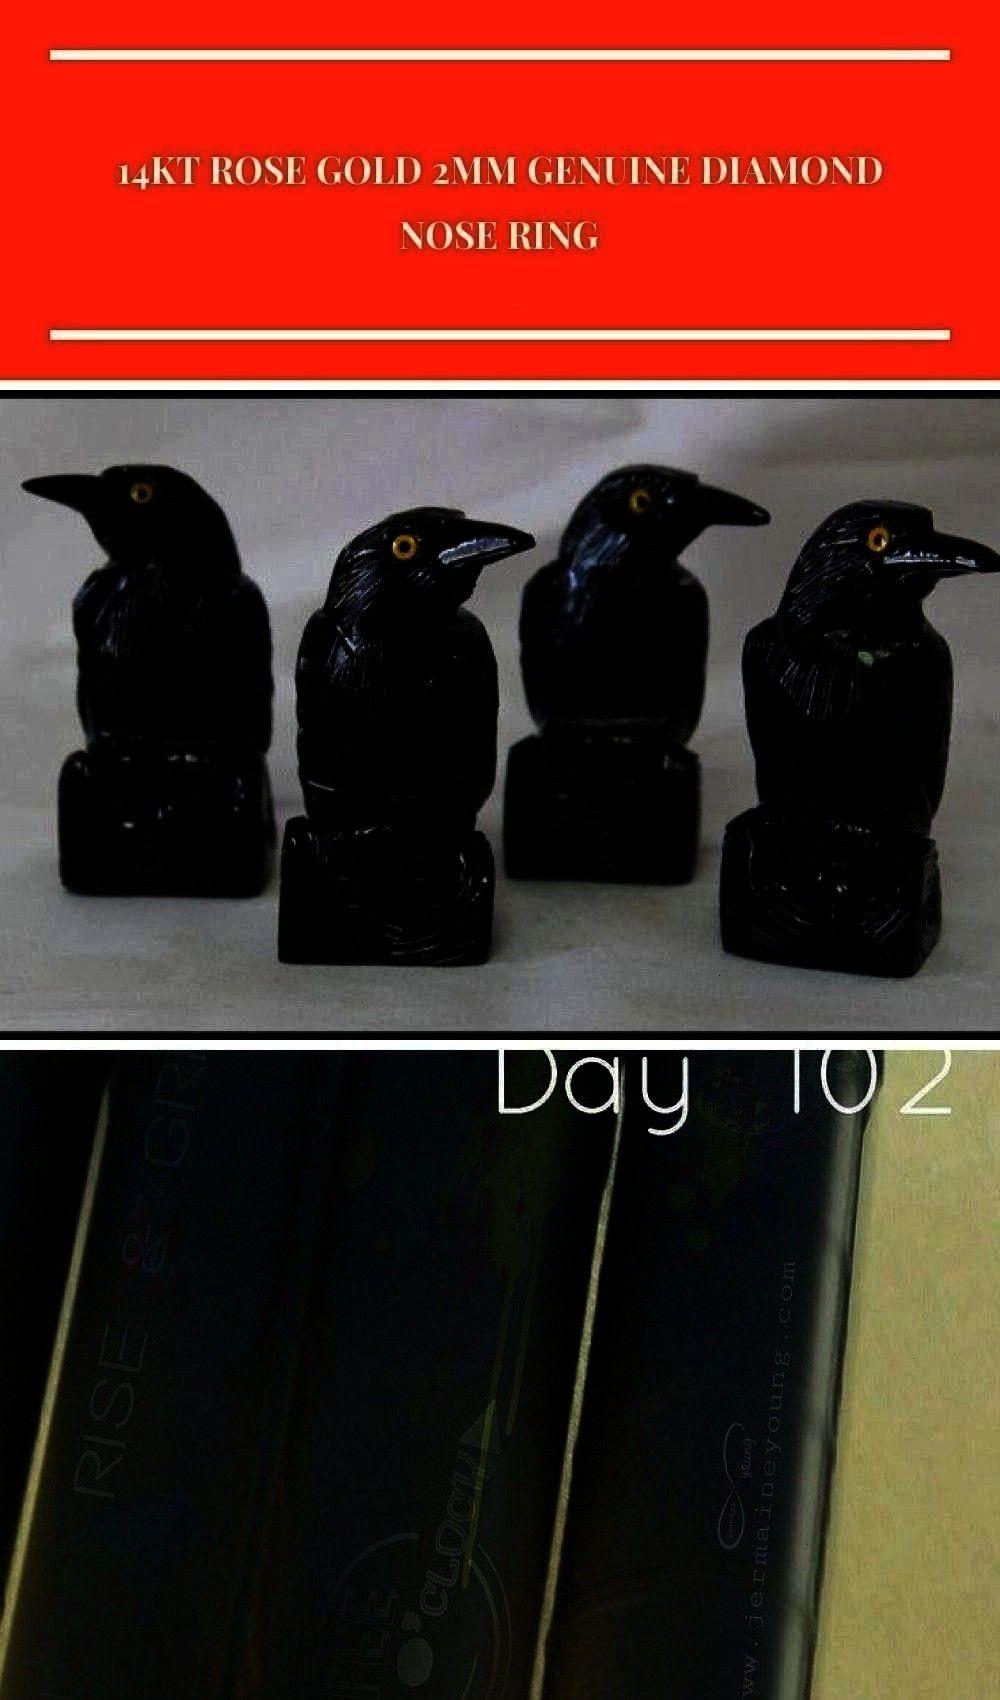 Totem Animal Gifts for Friends Home Office Decor Medium Black Onyx Raven Spirit Totem Animal Gifts for Friends Home Office Decor Medium Black Onyx Raven Spirit Totem Anim...